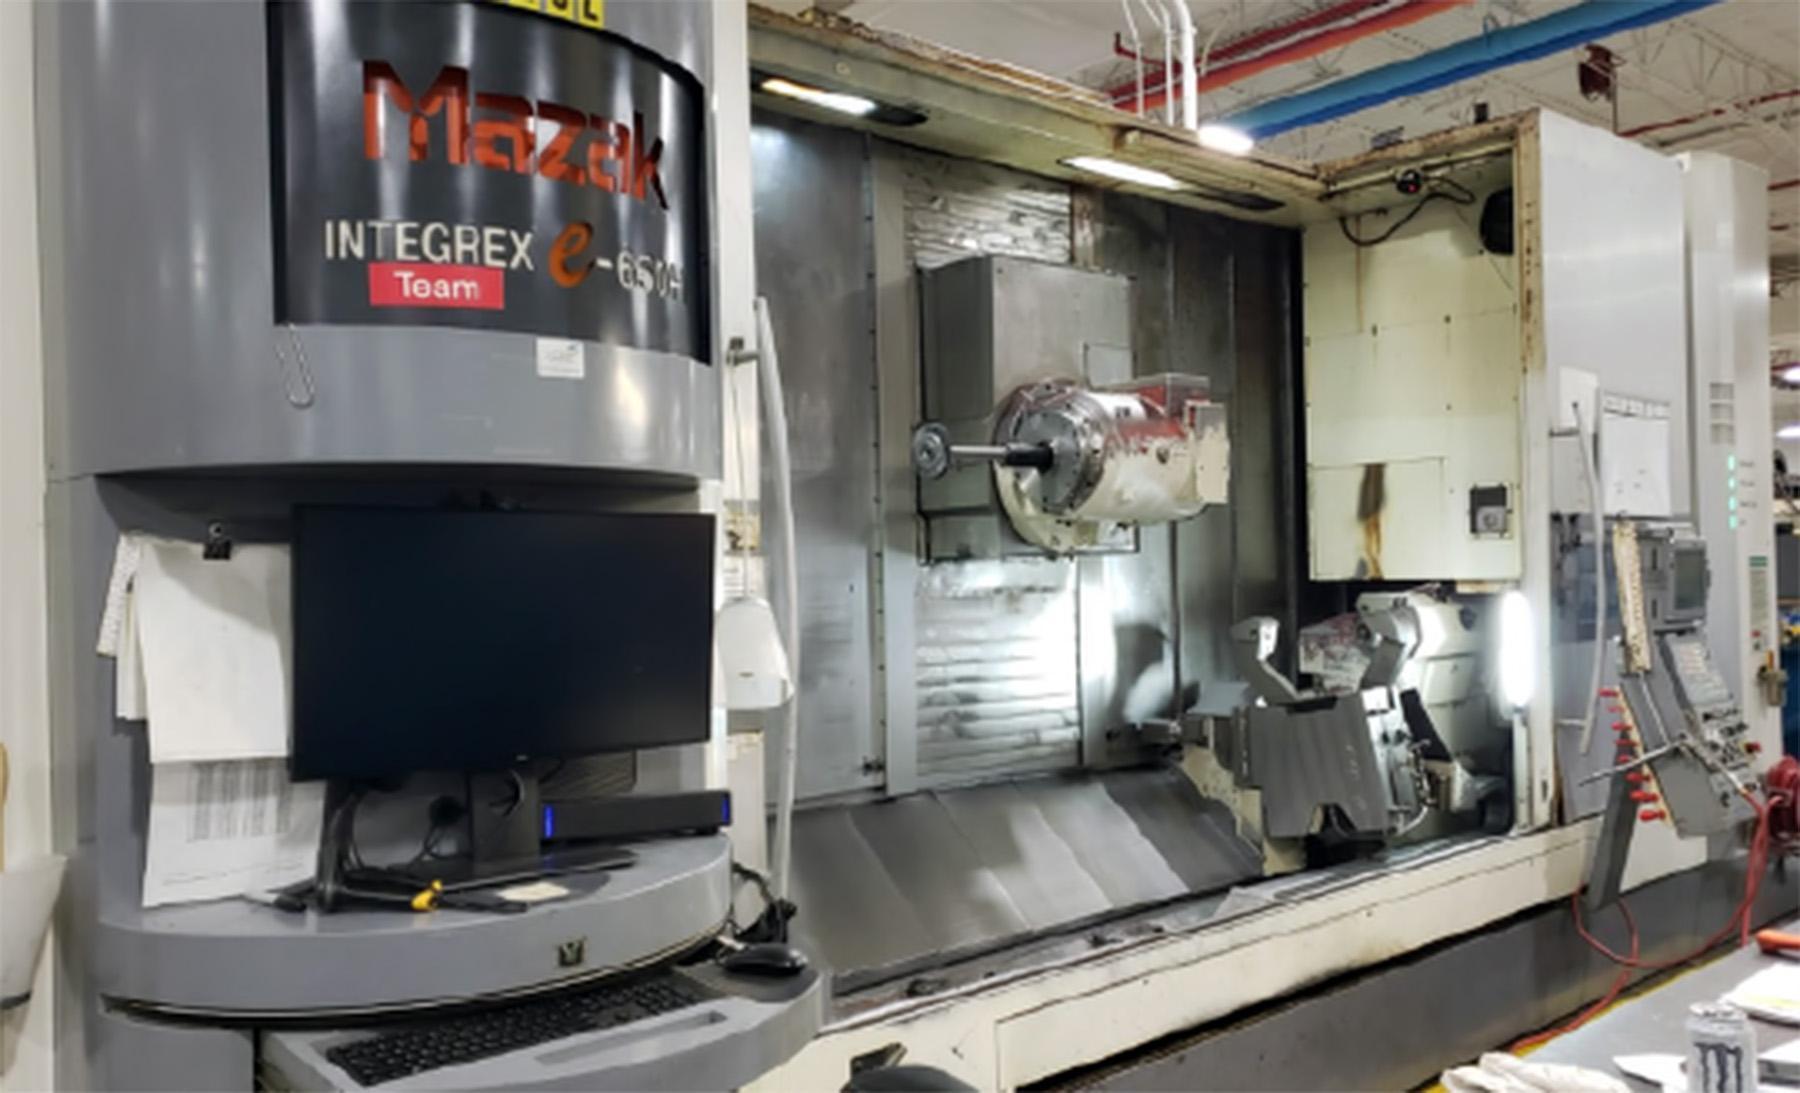 USED, MAZAK INTEGREX E650H CNC LATHE